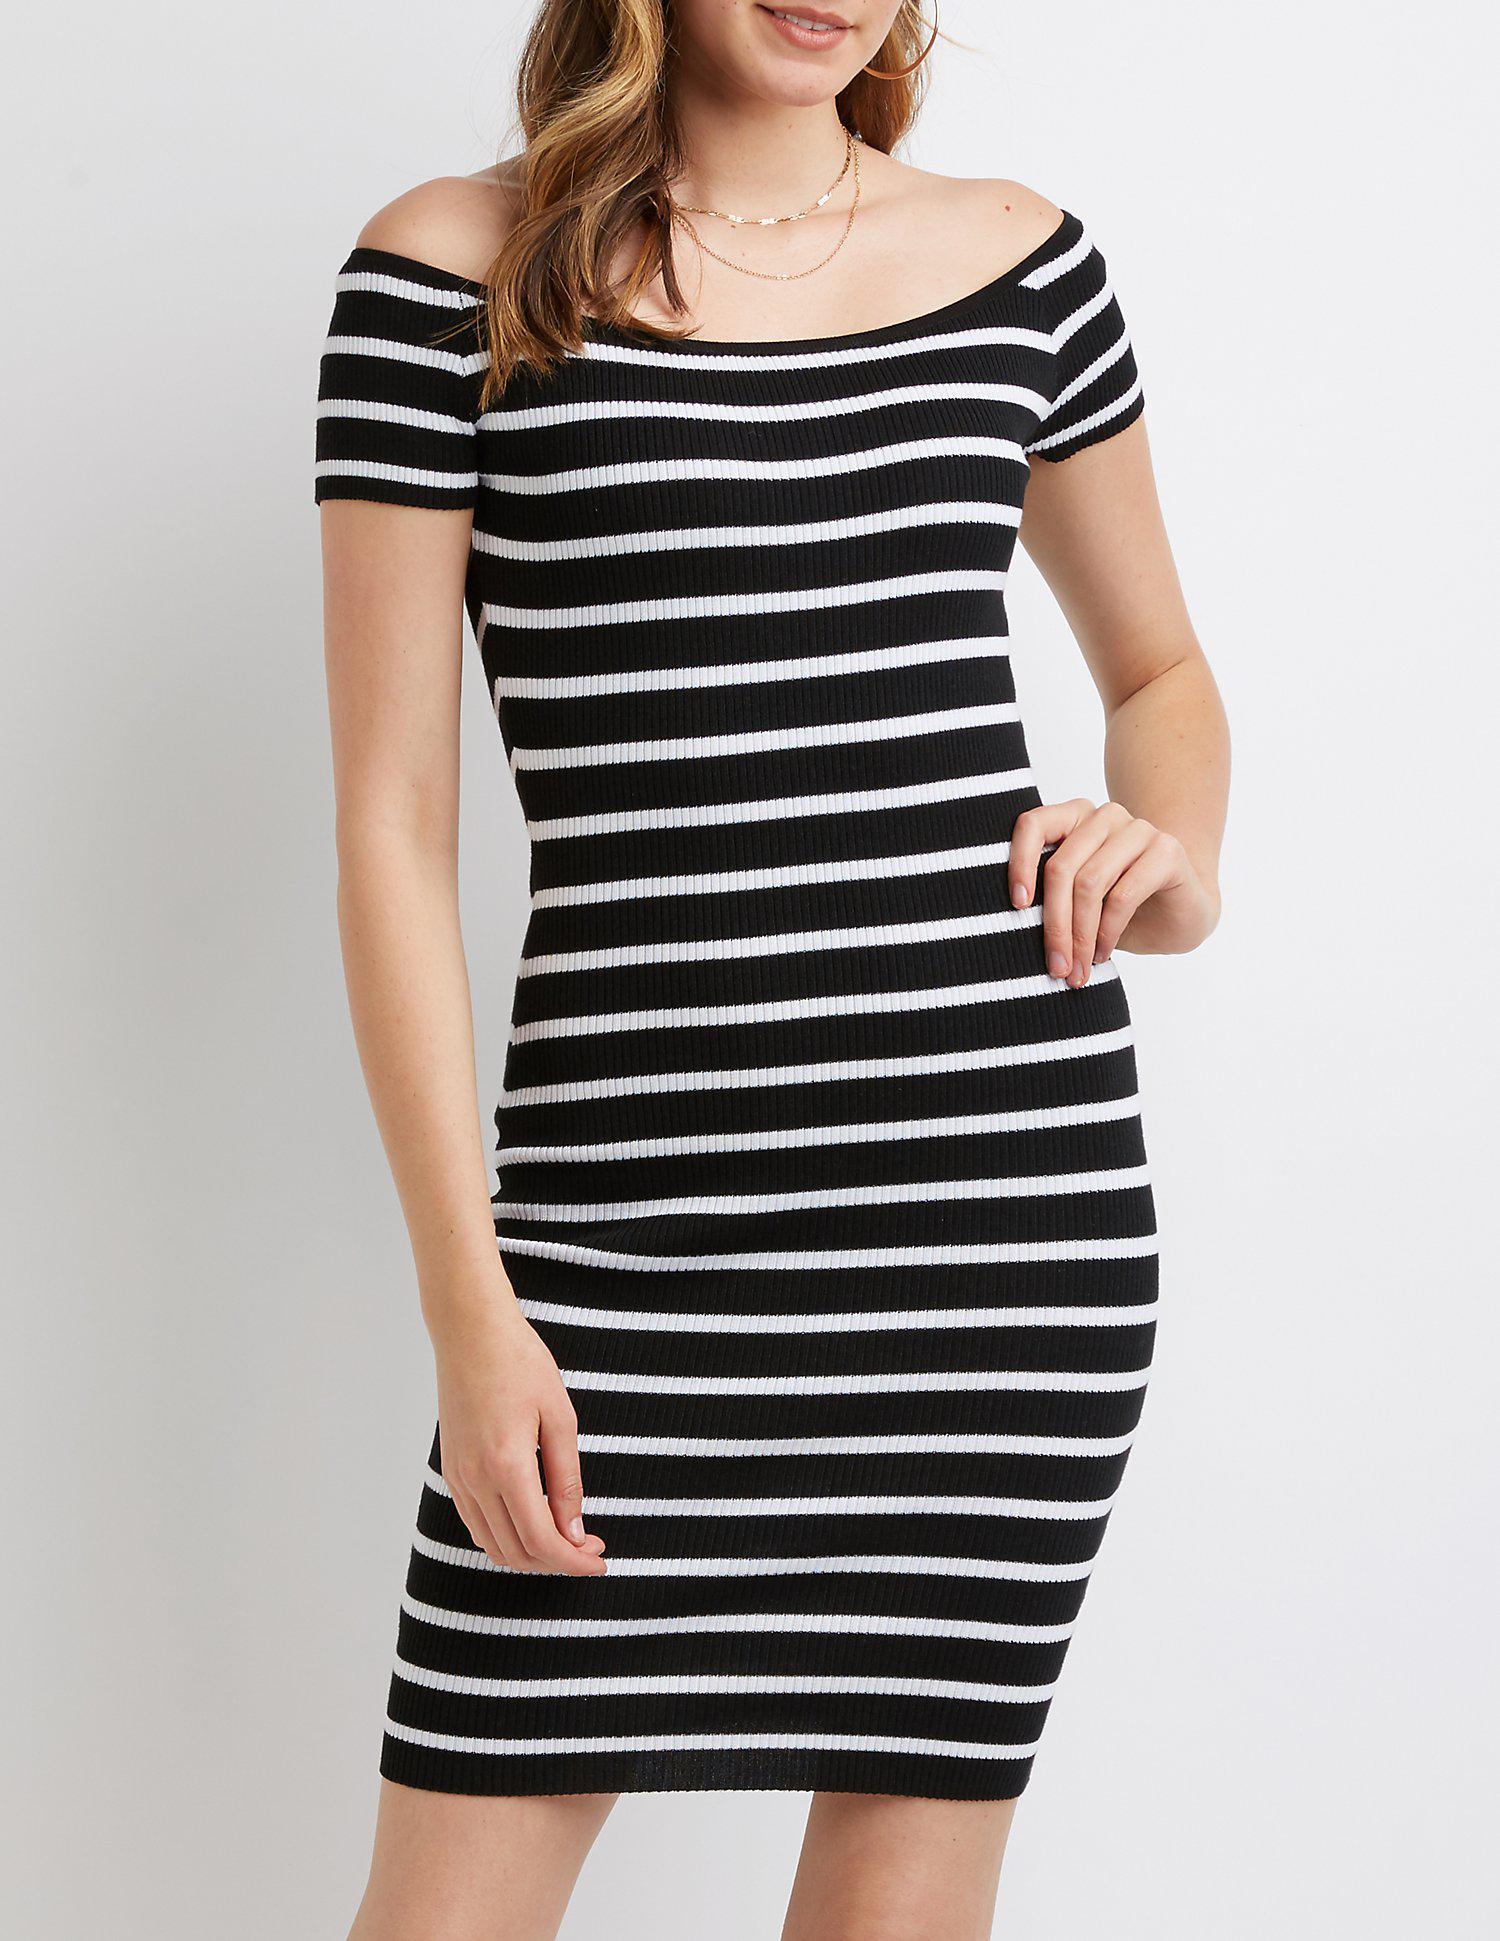 1e229961e73 Lyst - Charlotte Russe Off The Shoulder Bodycon Dress in Black